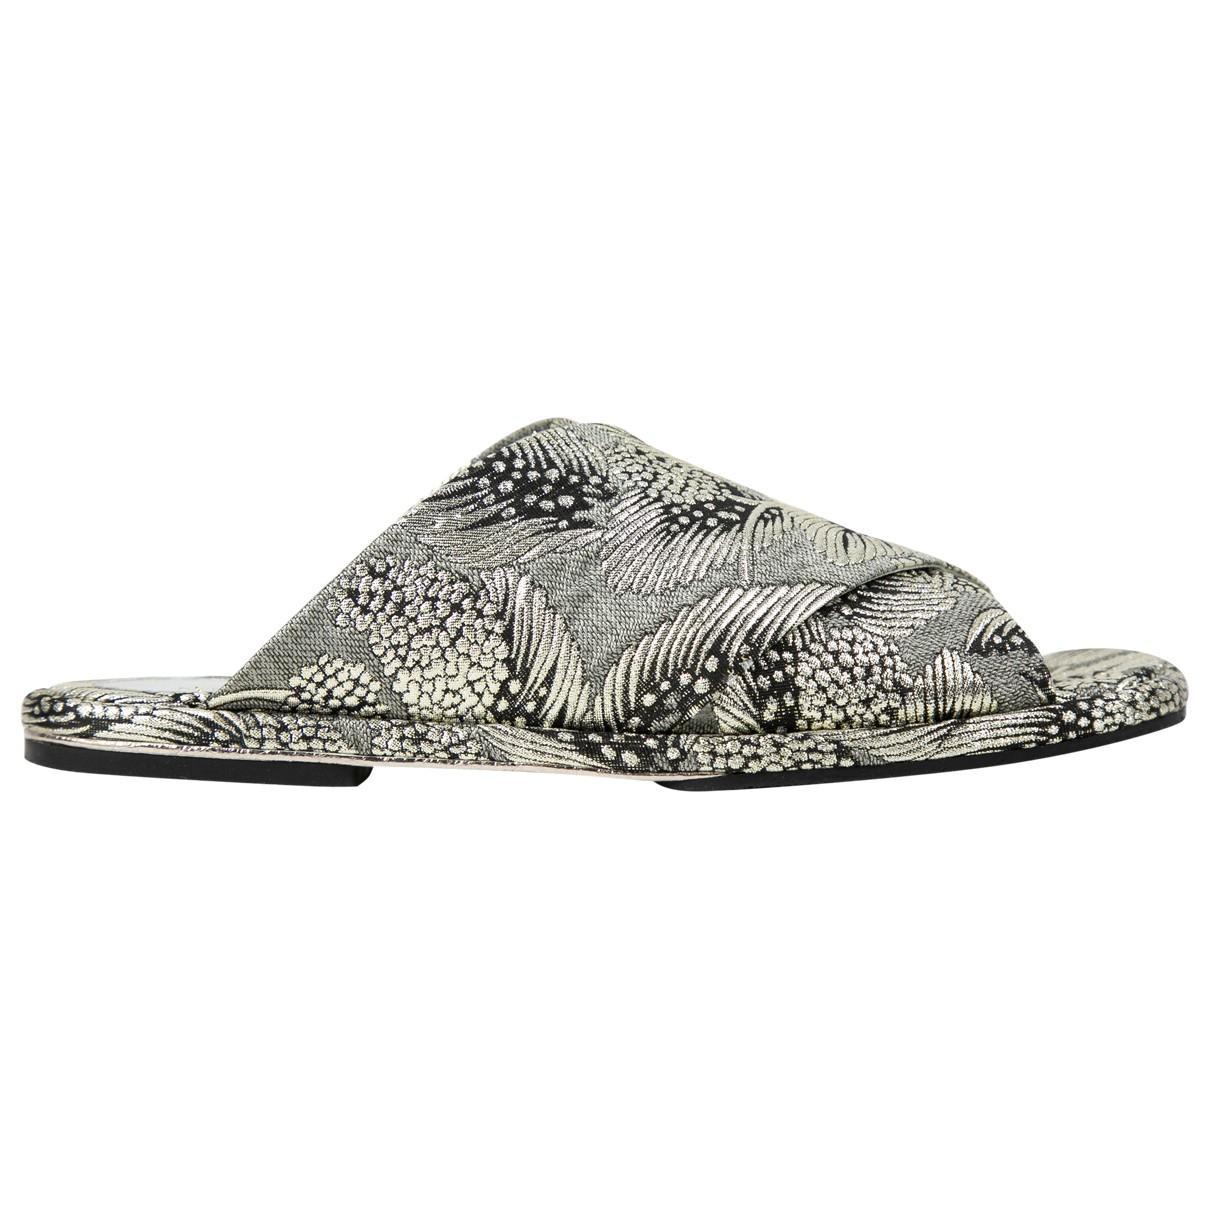 c3d660bab44 Dries Van Noten Jacquard Slide Sandals W  Tags in Metallic - Lyst